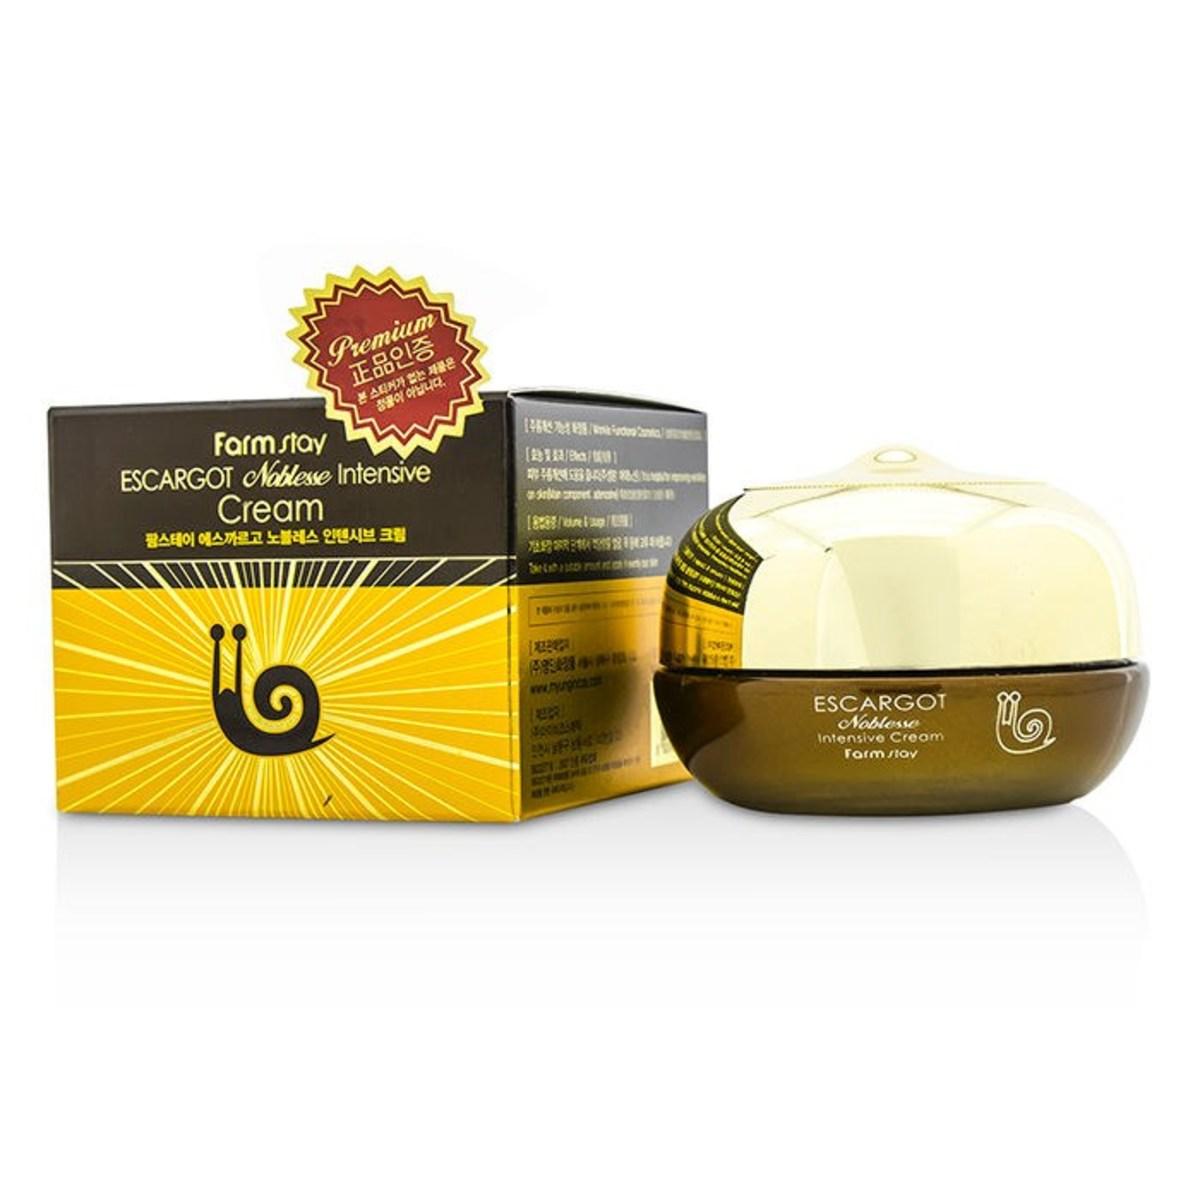 ESCARGOT Noblesse Intensive Cream 50g